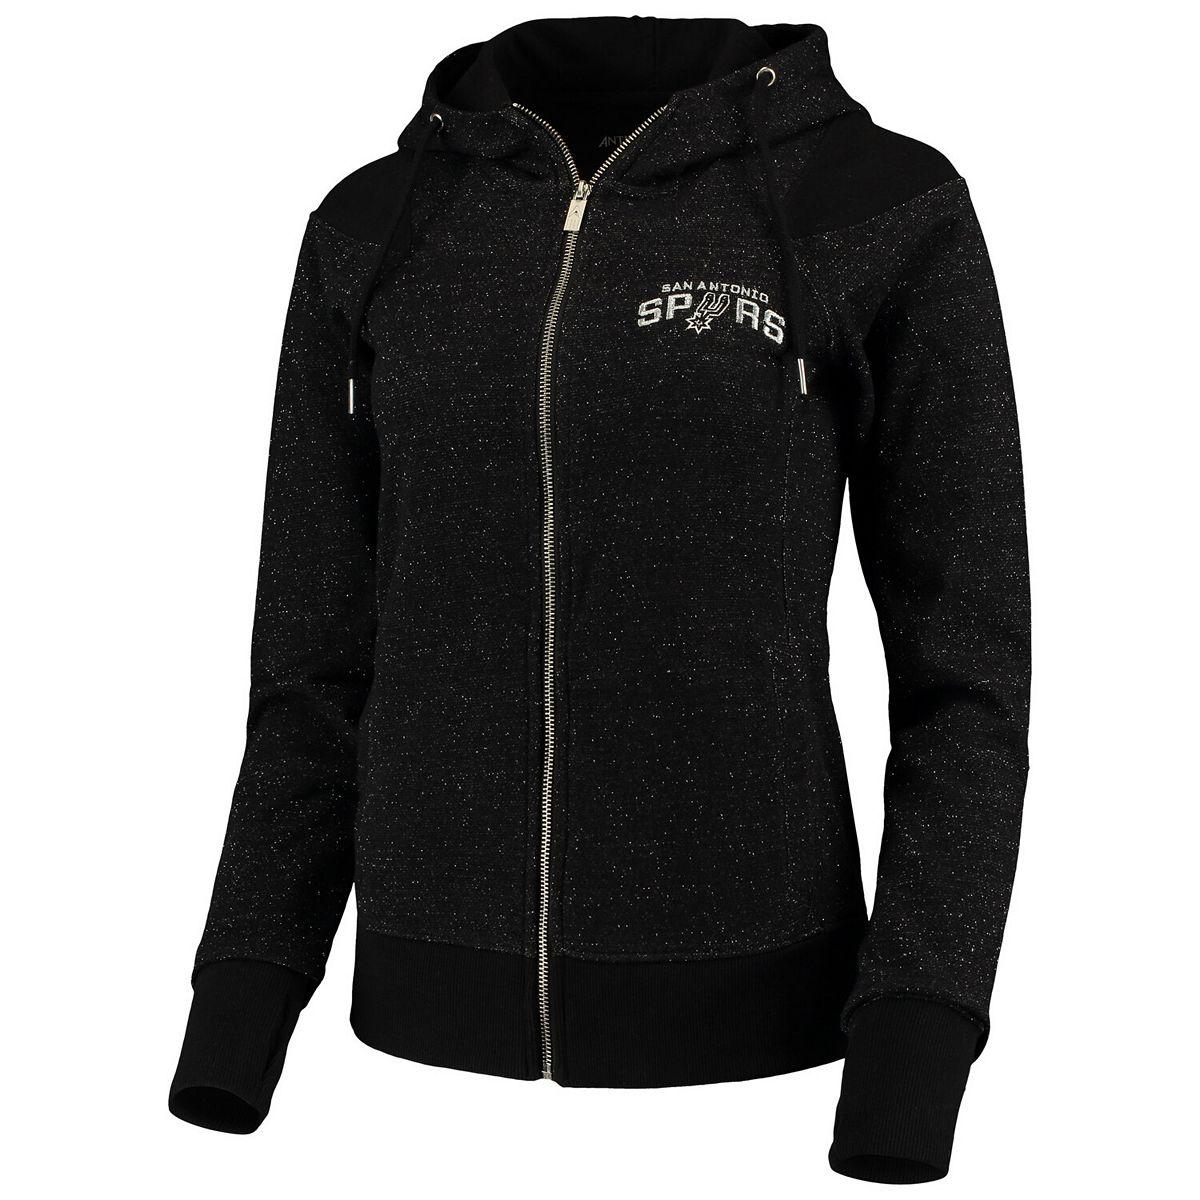 Women's Antigua Heathered Black San Antonio Spurs Lineup Tri-Blend French Terry Full-Zip Hoodie CJGHW